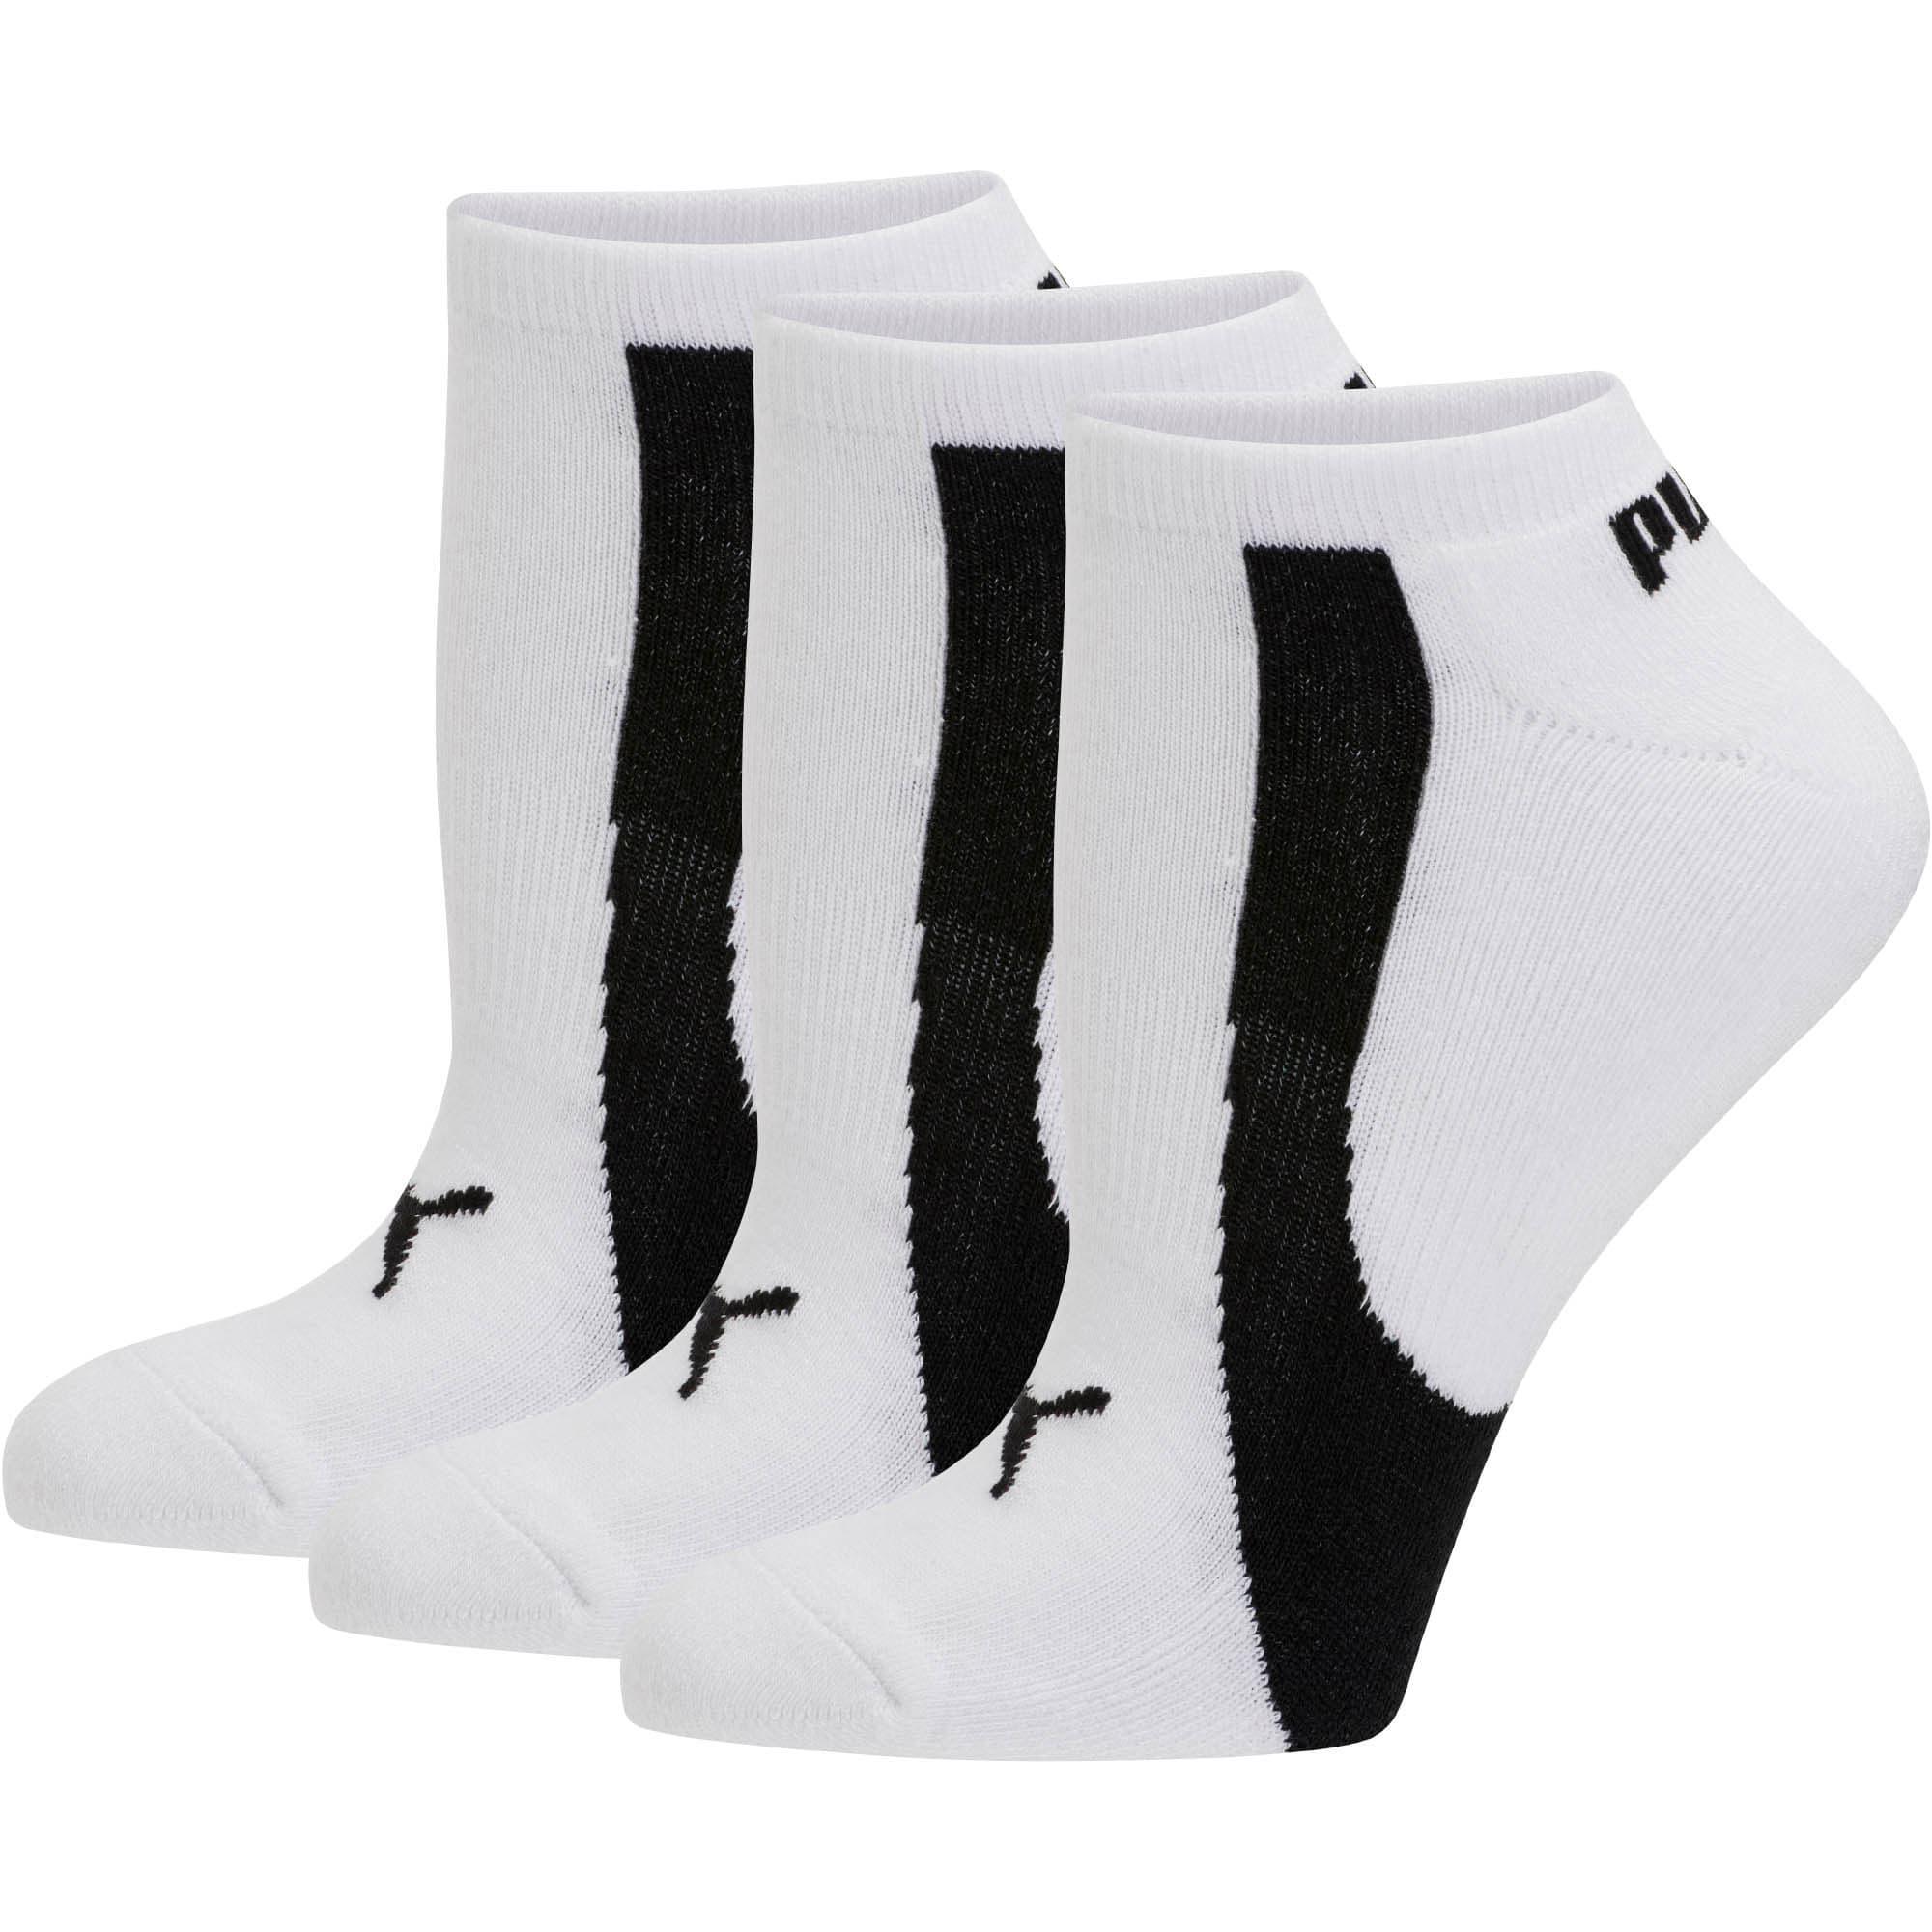 Thumbnail 1 of Women's No Show Socks [3 Pack], white-black, medium